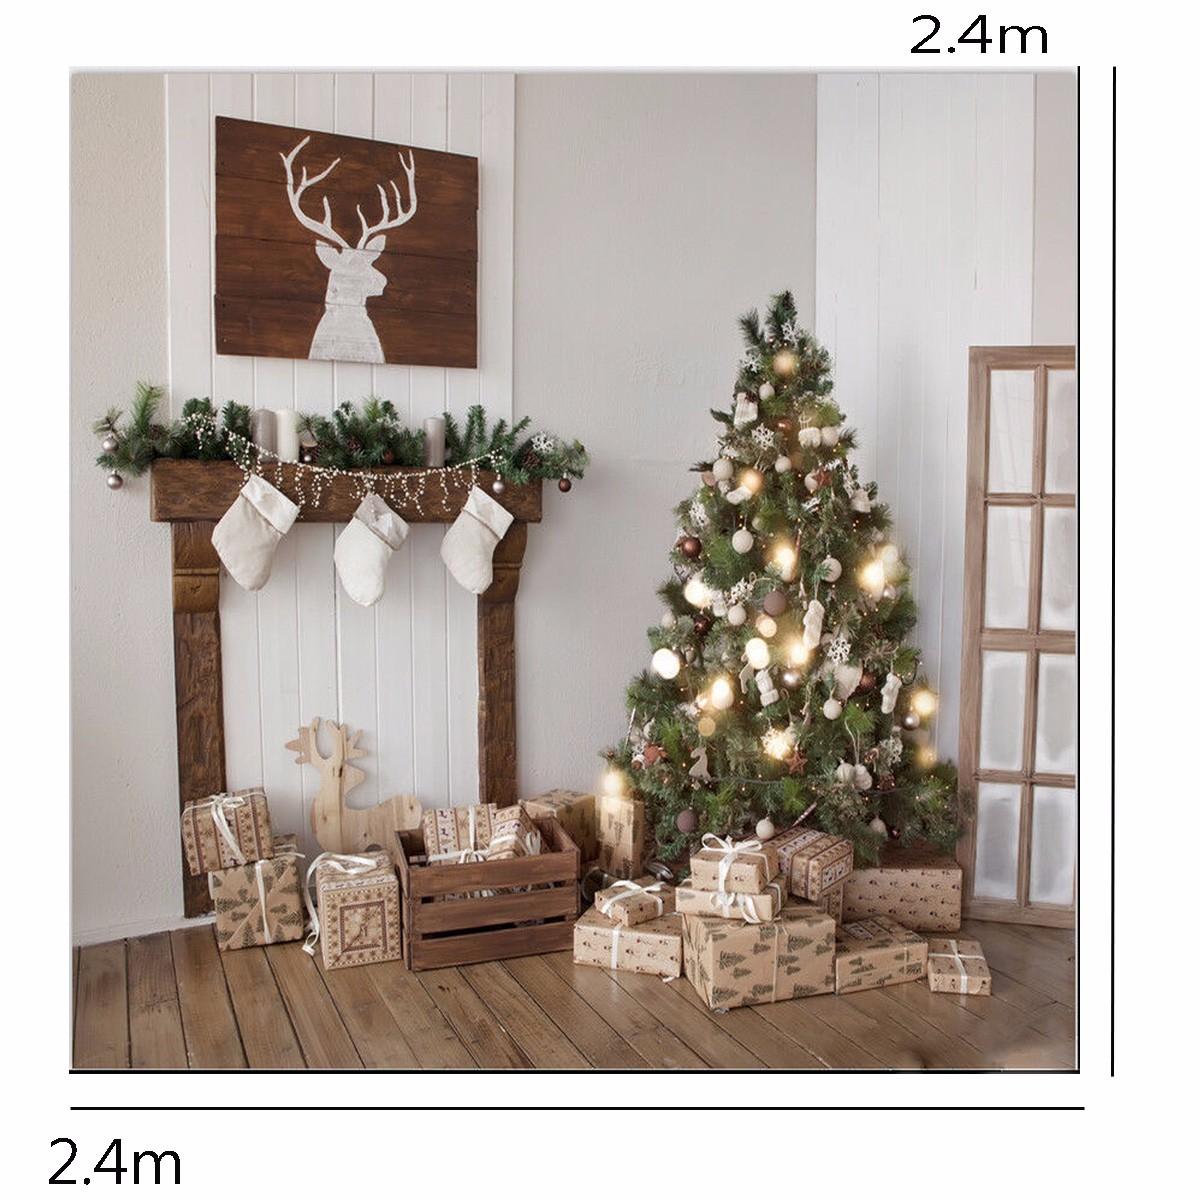 8X8FT Christmas Custom Photography Background Square Backdrop Studio Prop 2.4mx2.4m